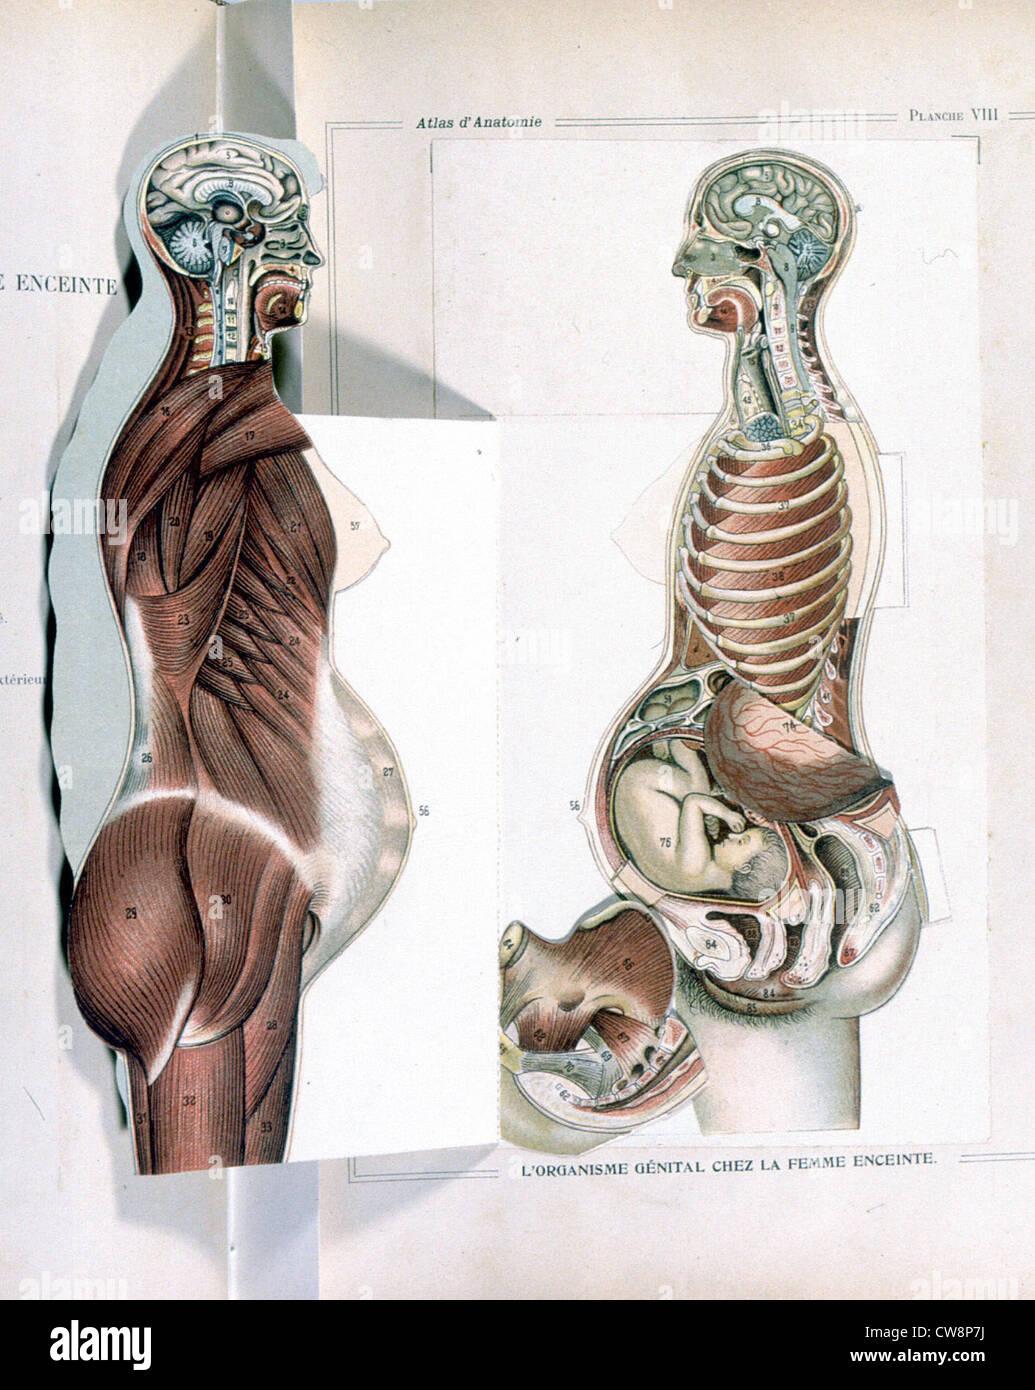 Anatomy Female Genital Organs Sciences Stock Photos & Anatomy Female ...